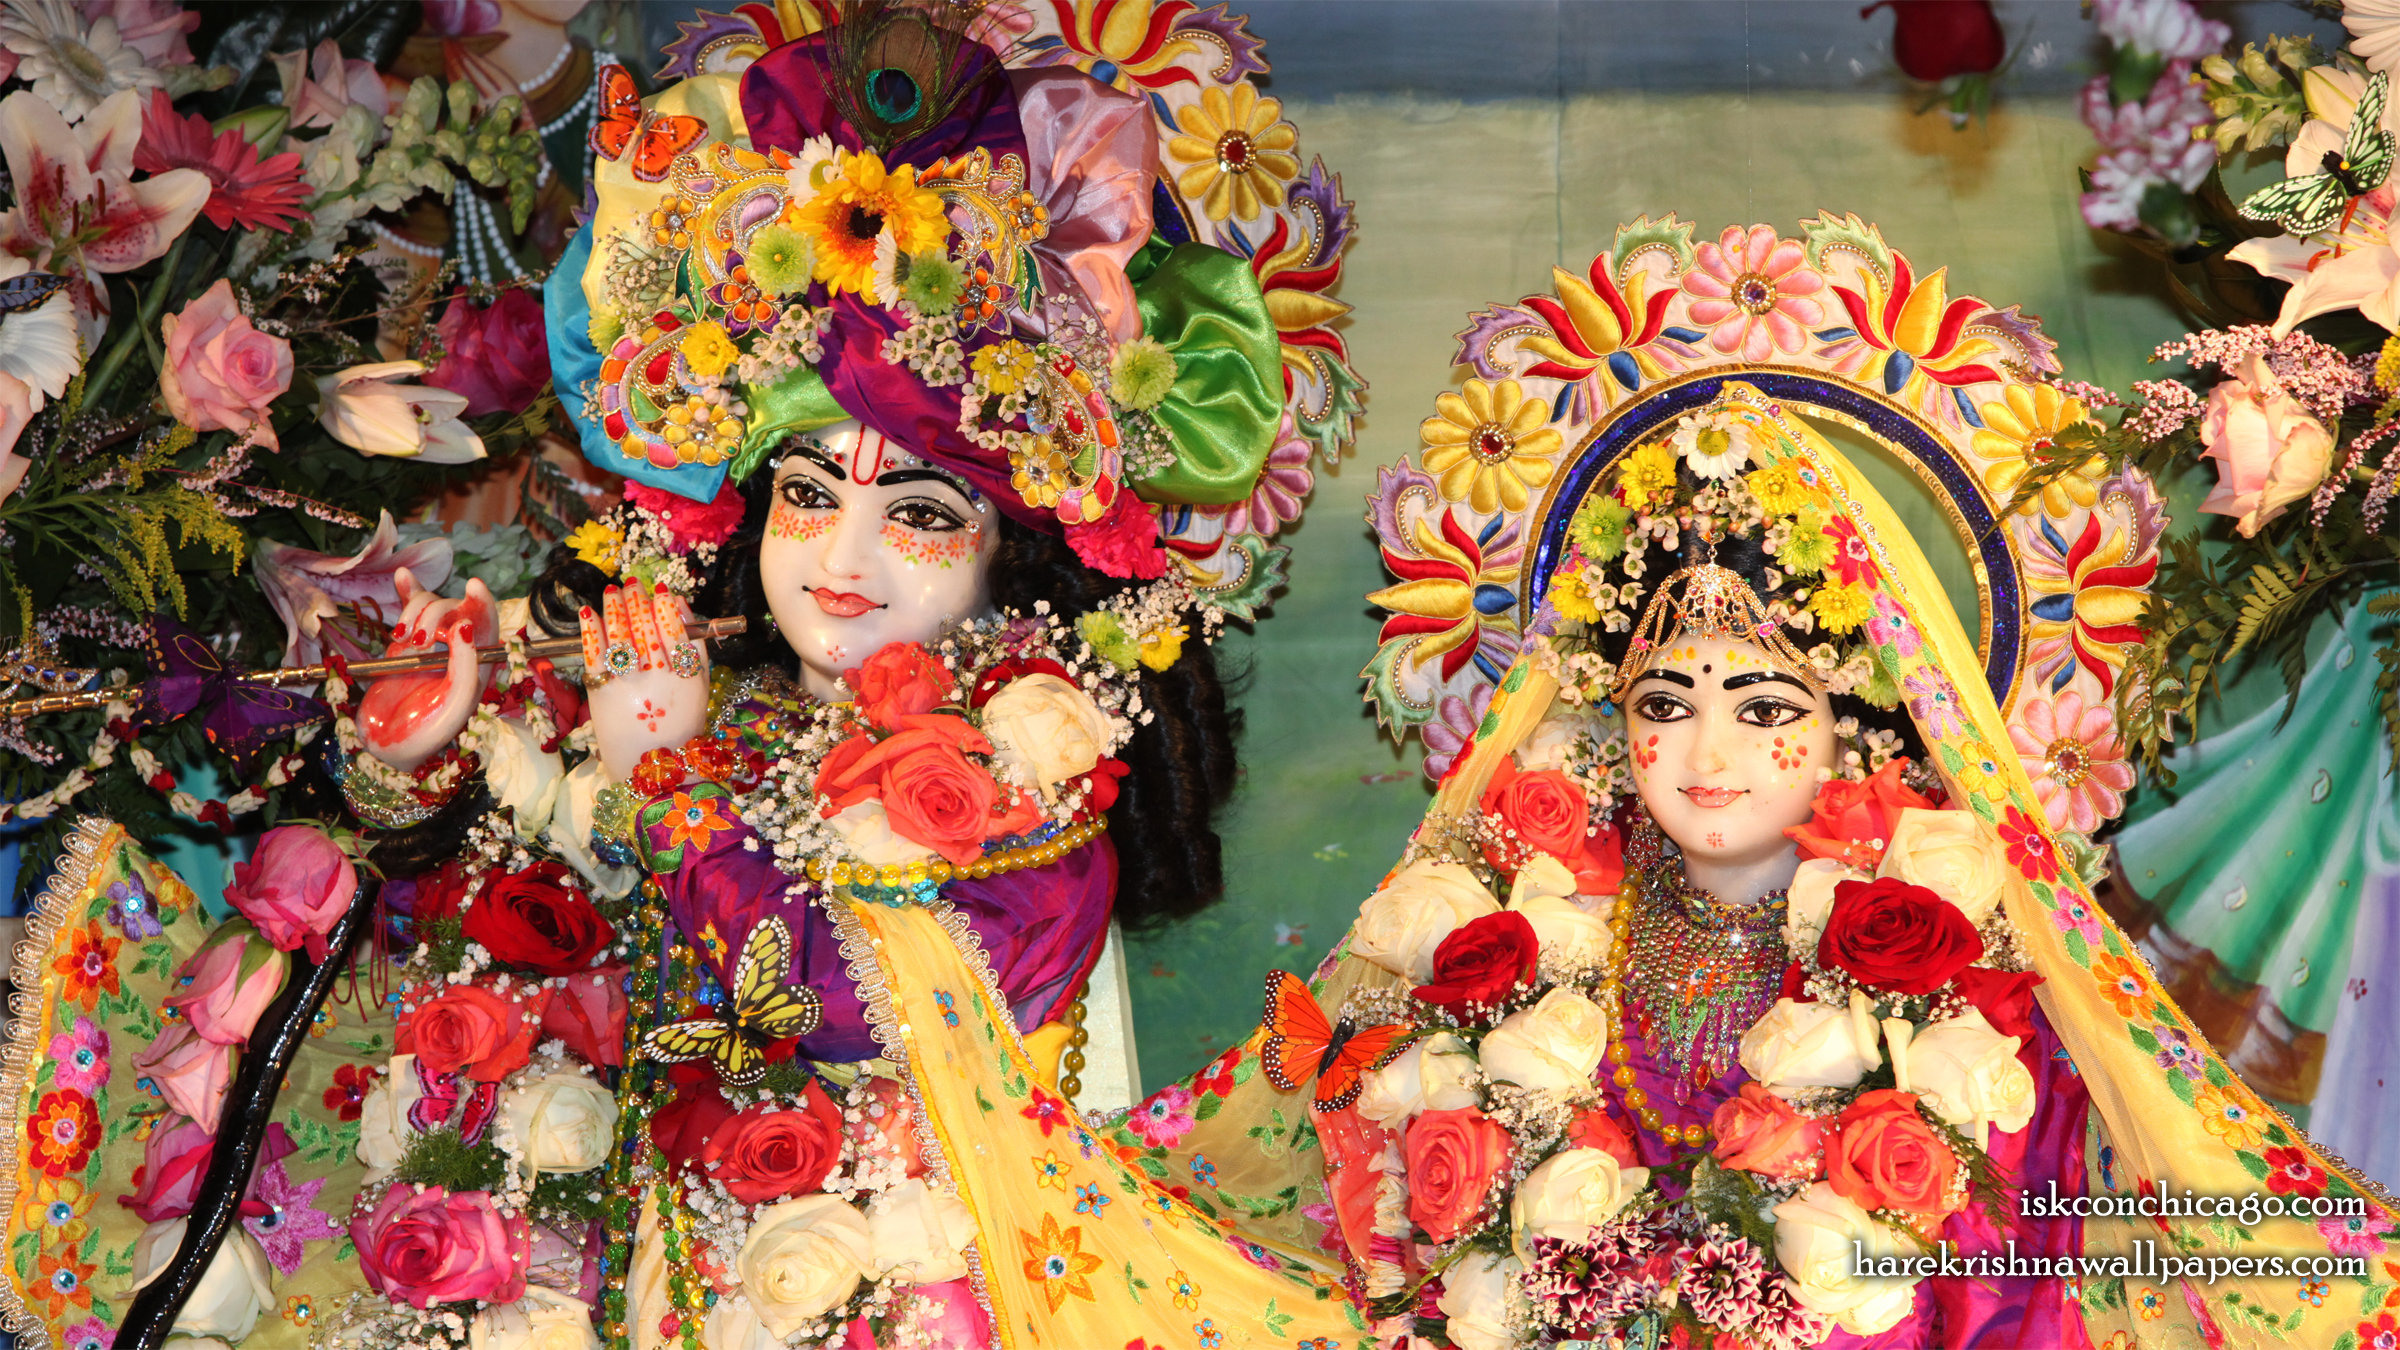 Sri Sri Kishore Kishori Close up Wallpaper (002) Size 2400x1350 Download